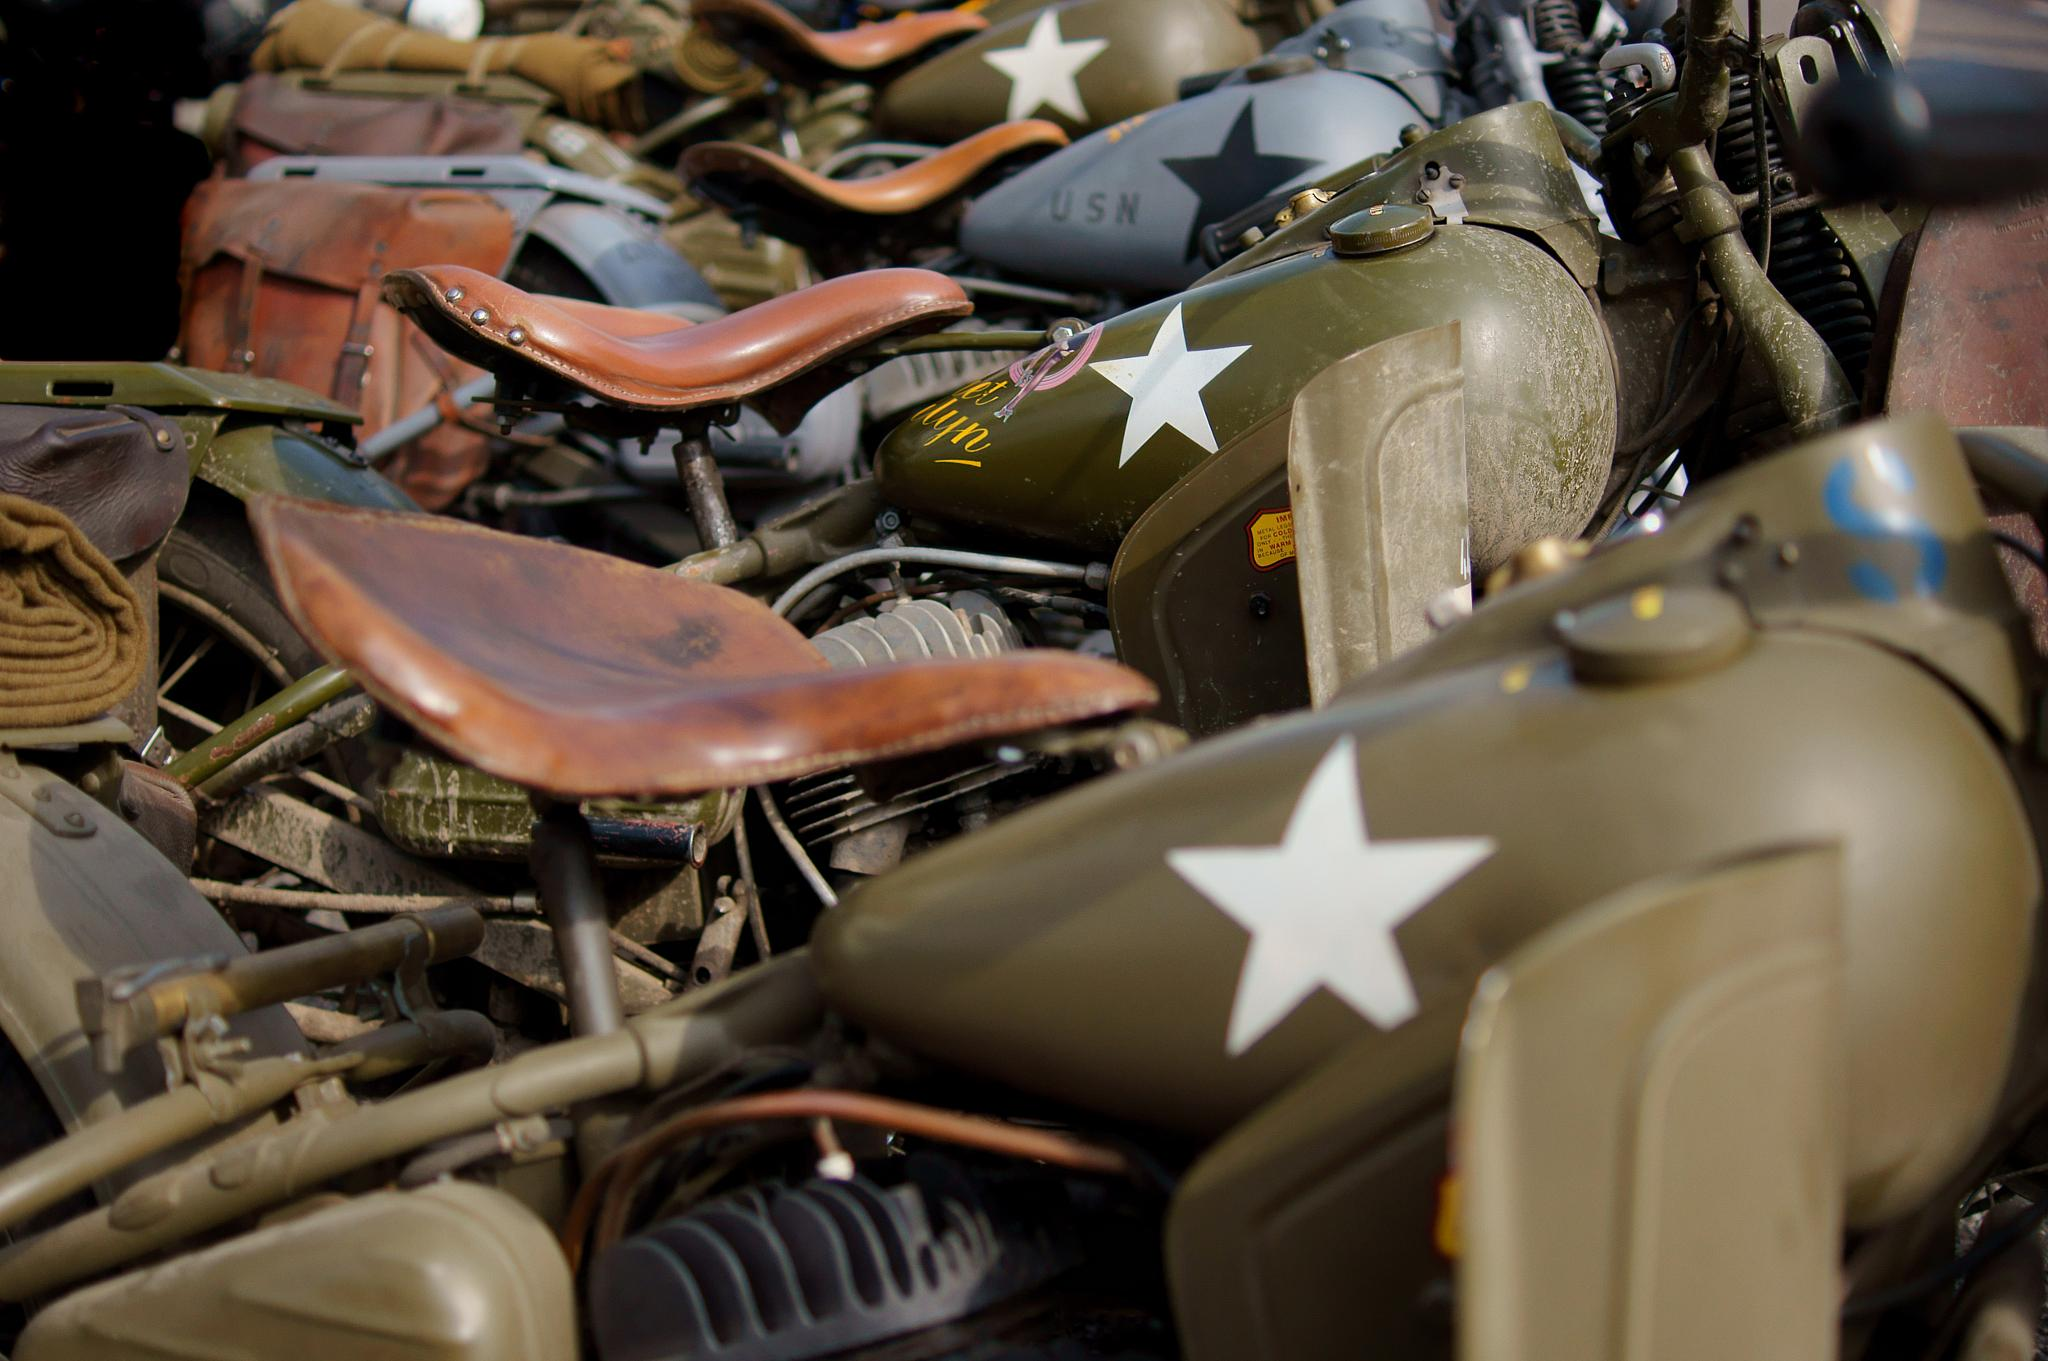 WWII bikes by Matt H. Imaging